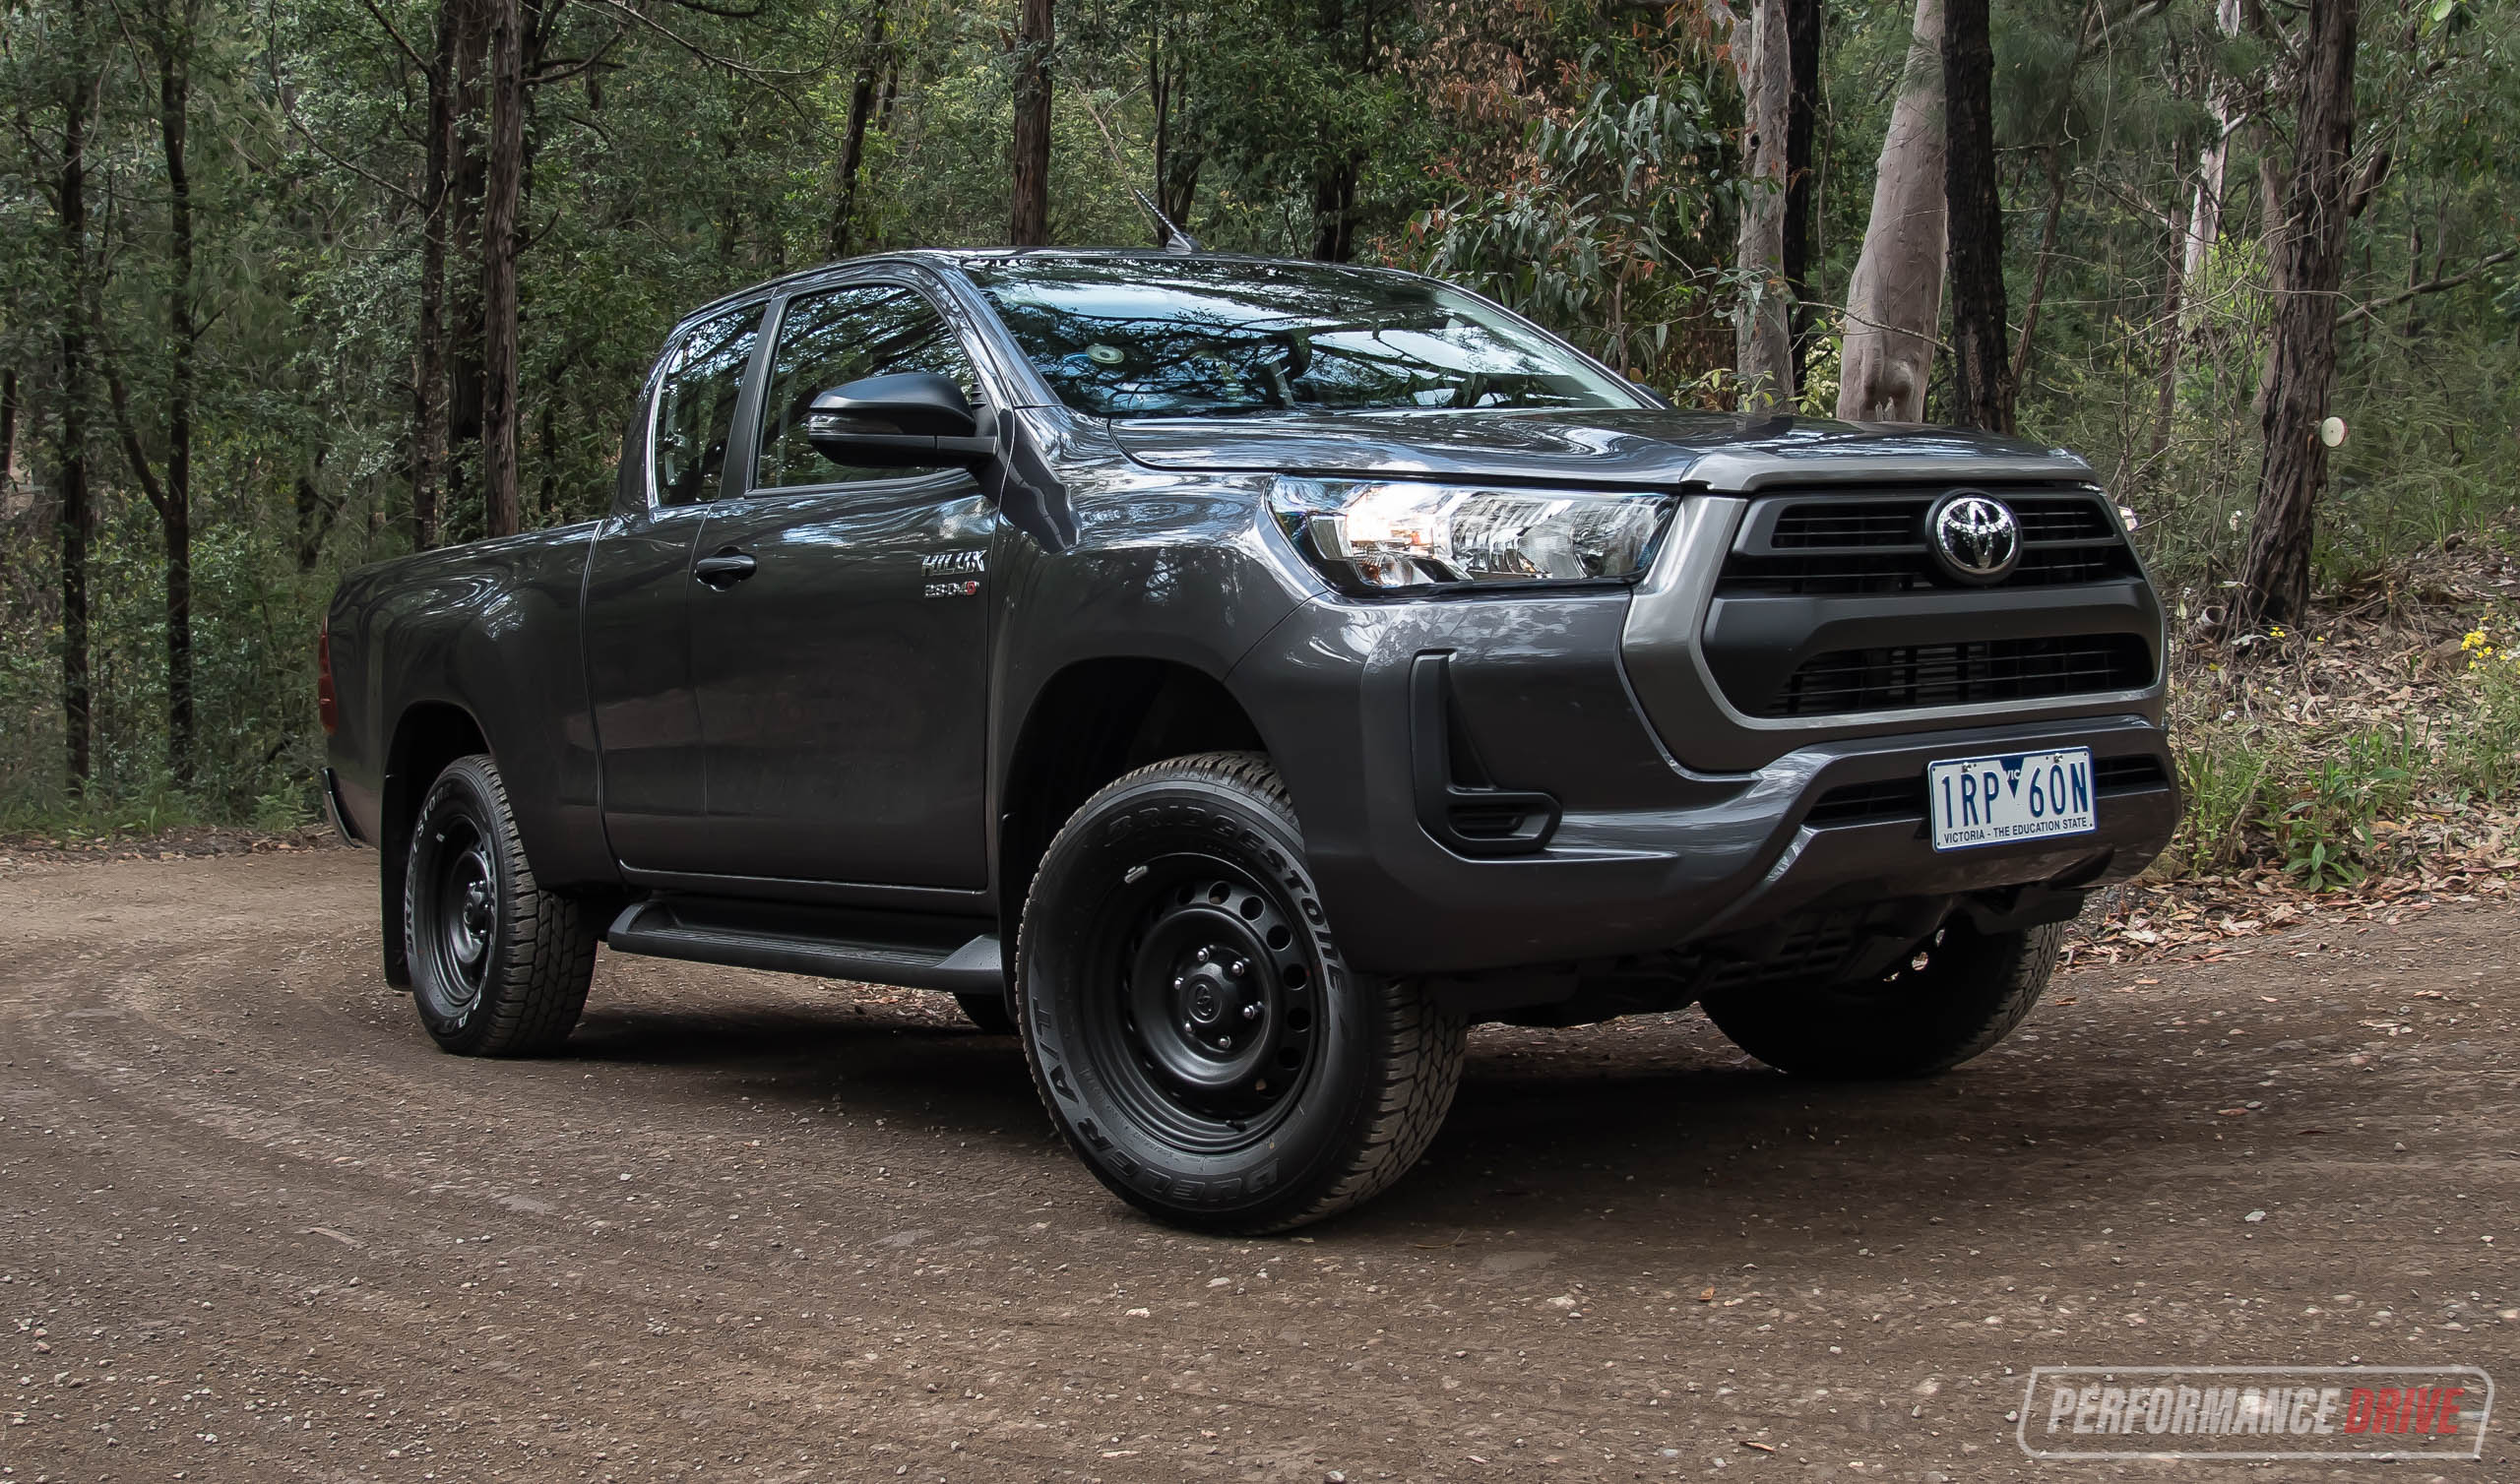 2021 Toyota HiLux SR Hi-Rider 4×2 review (video)